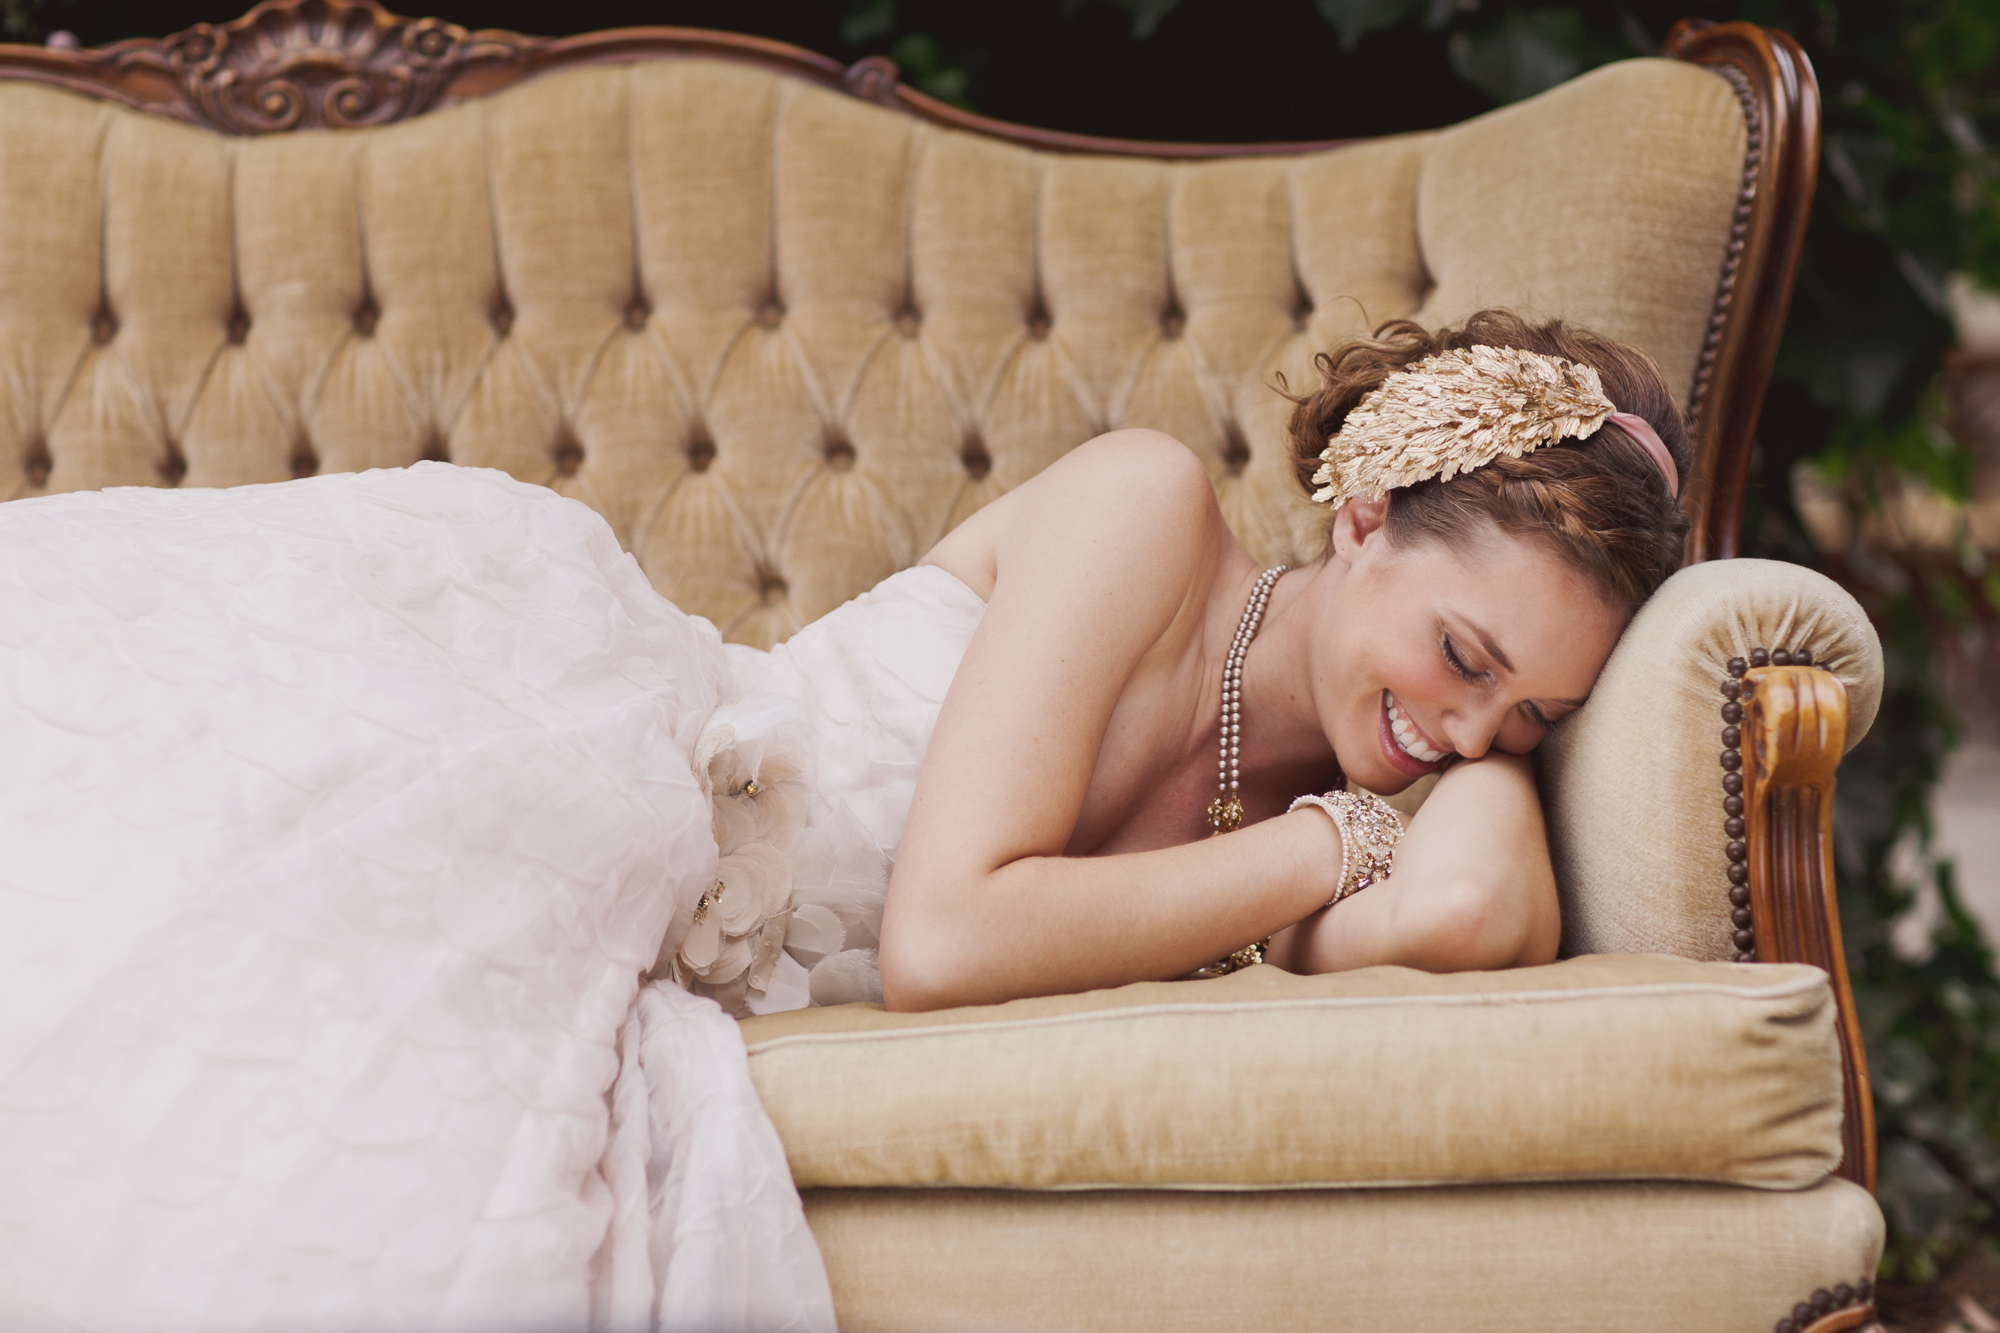 jennifer-skog-bridal-fashion-photographer-lifestyle-0013.jpg